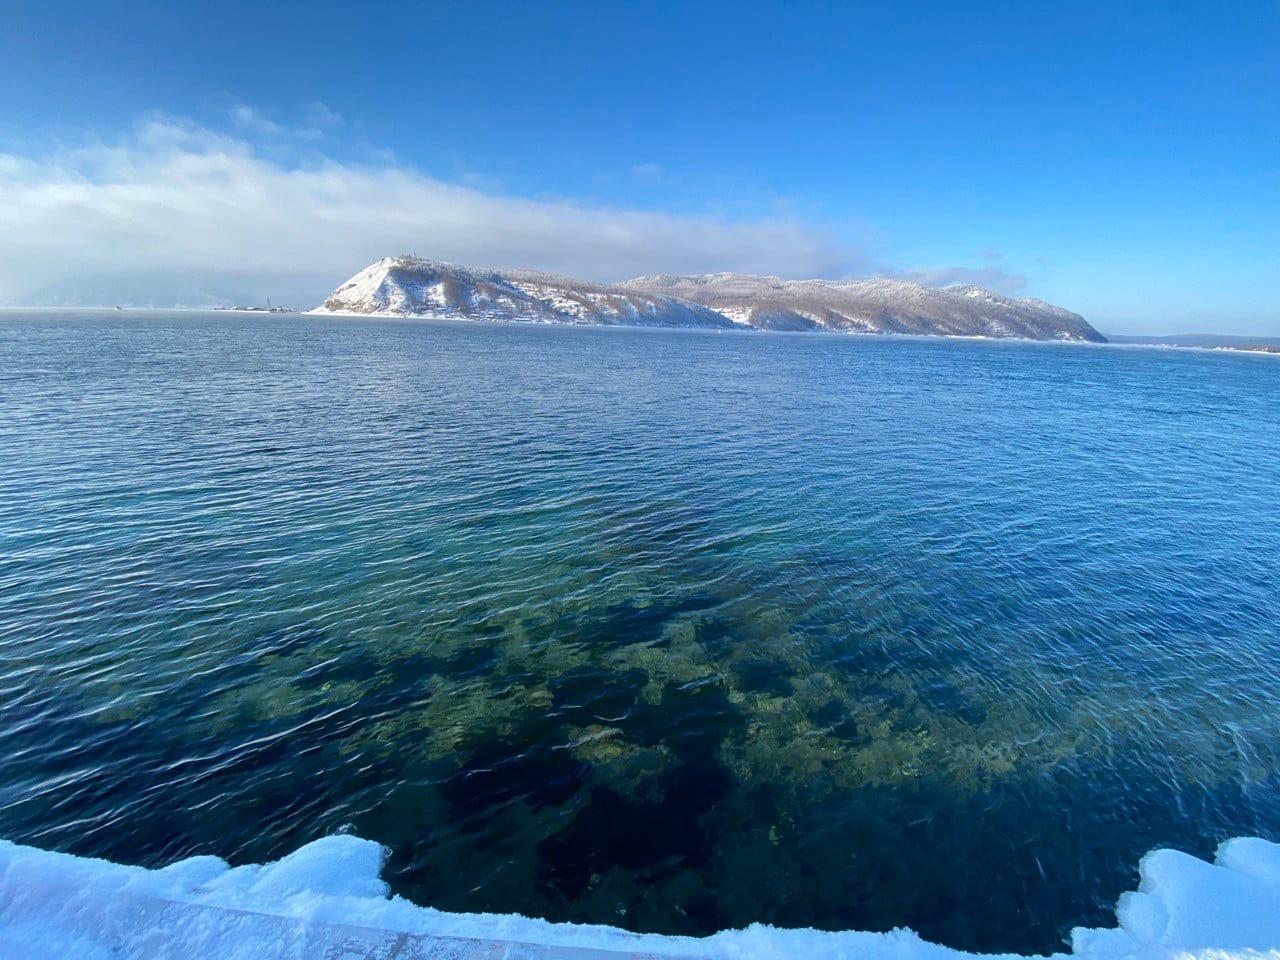 Онлайн-экскурсия: «Знакомство с Байкалом и Ангарой»